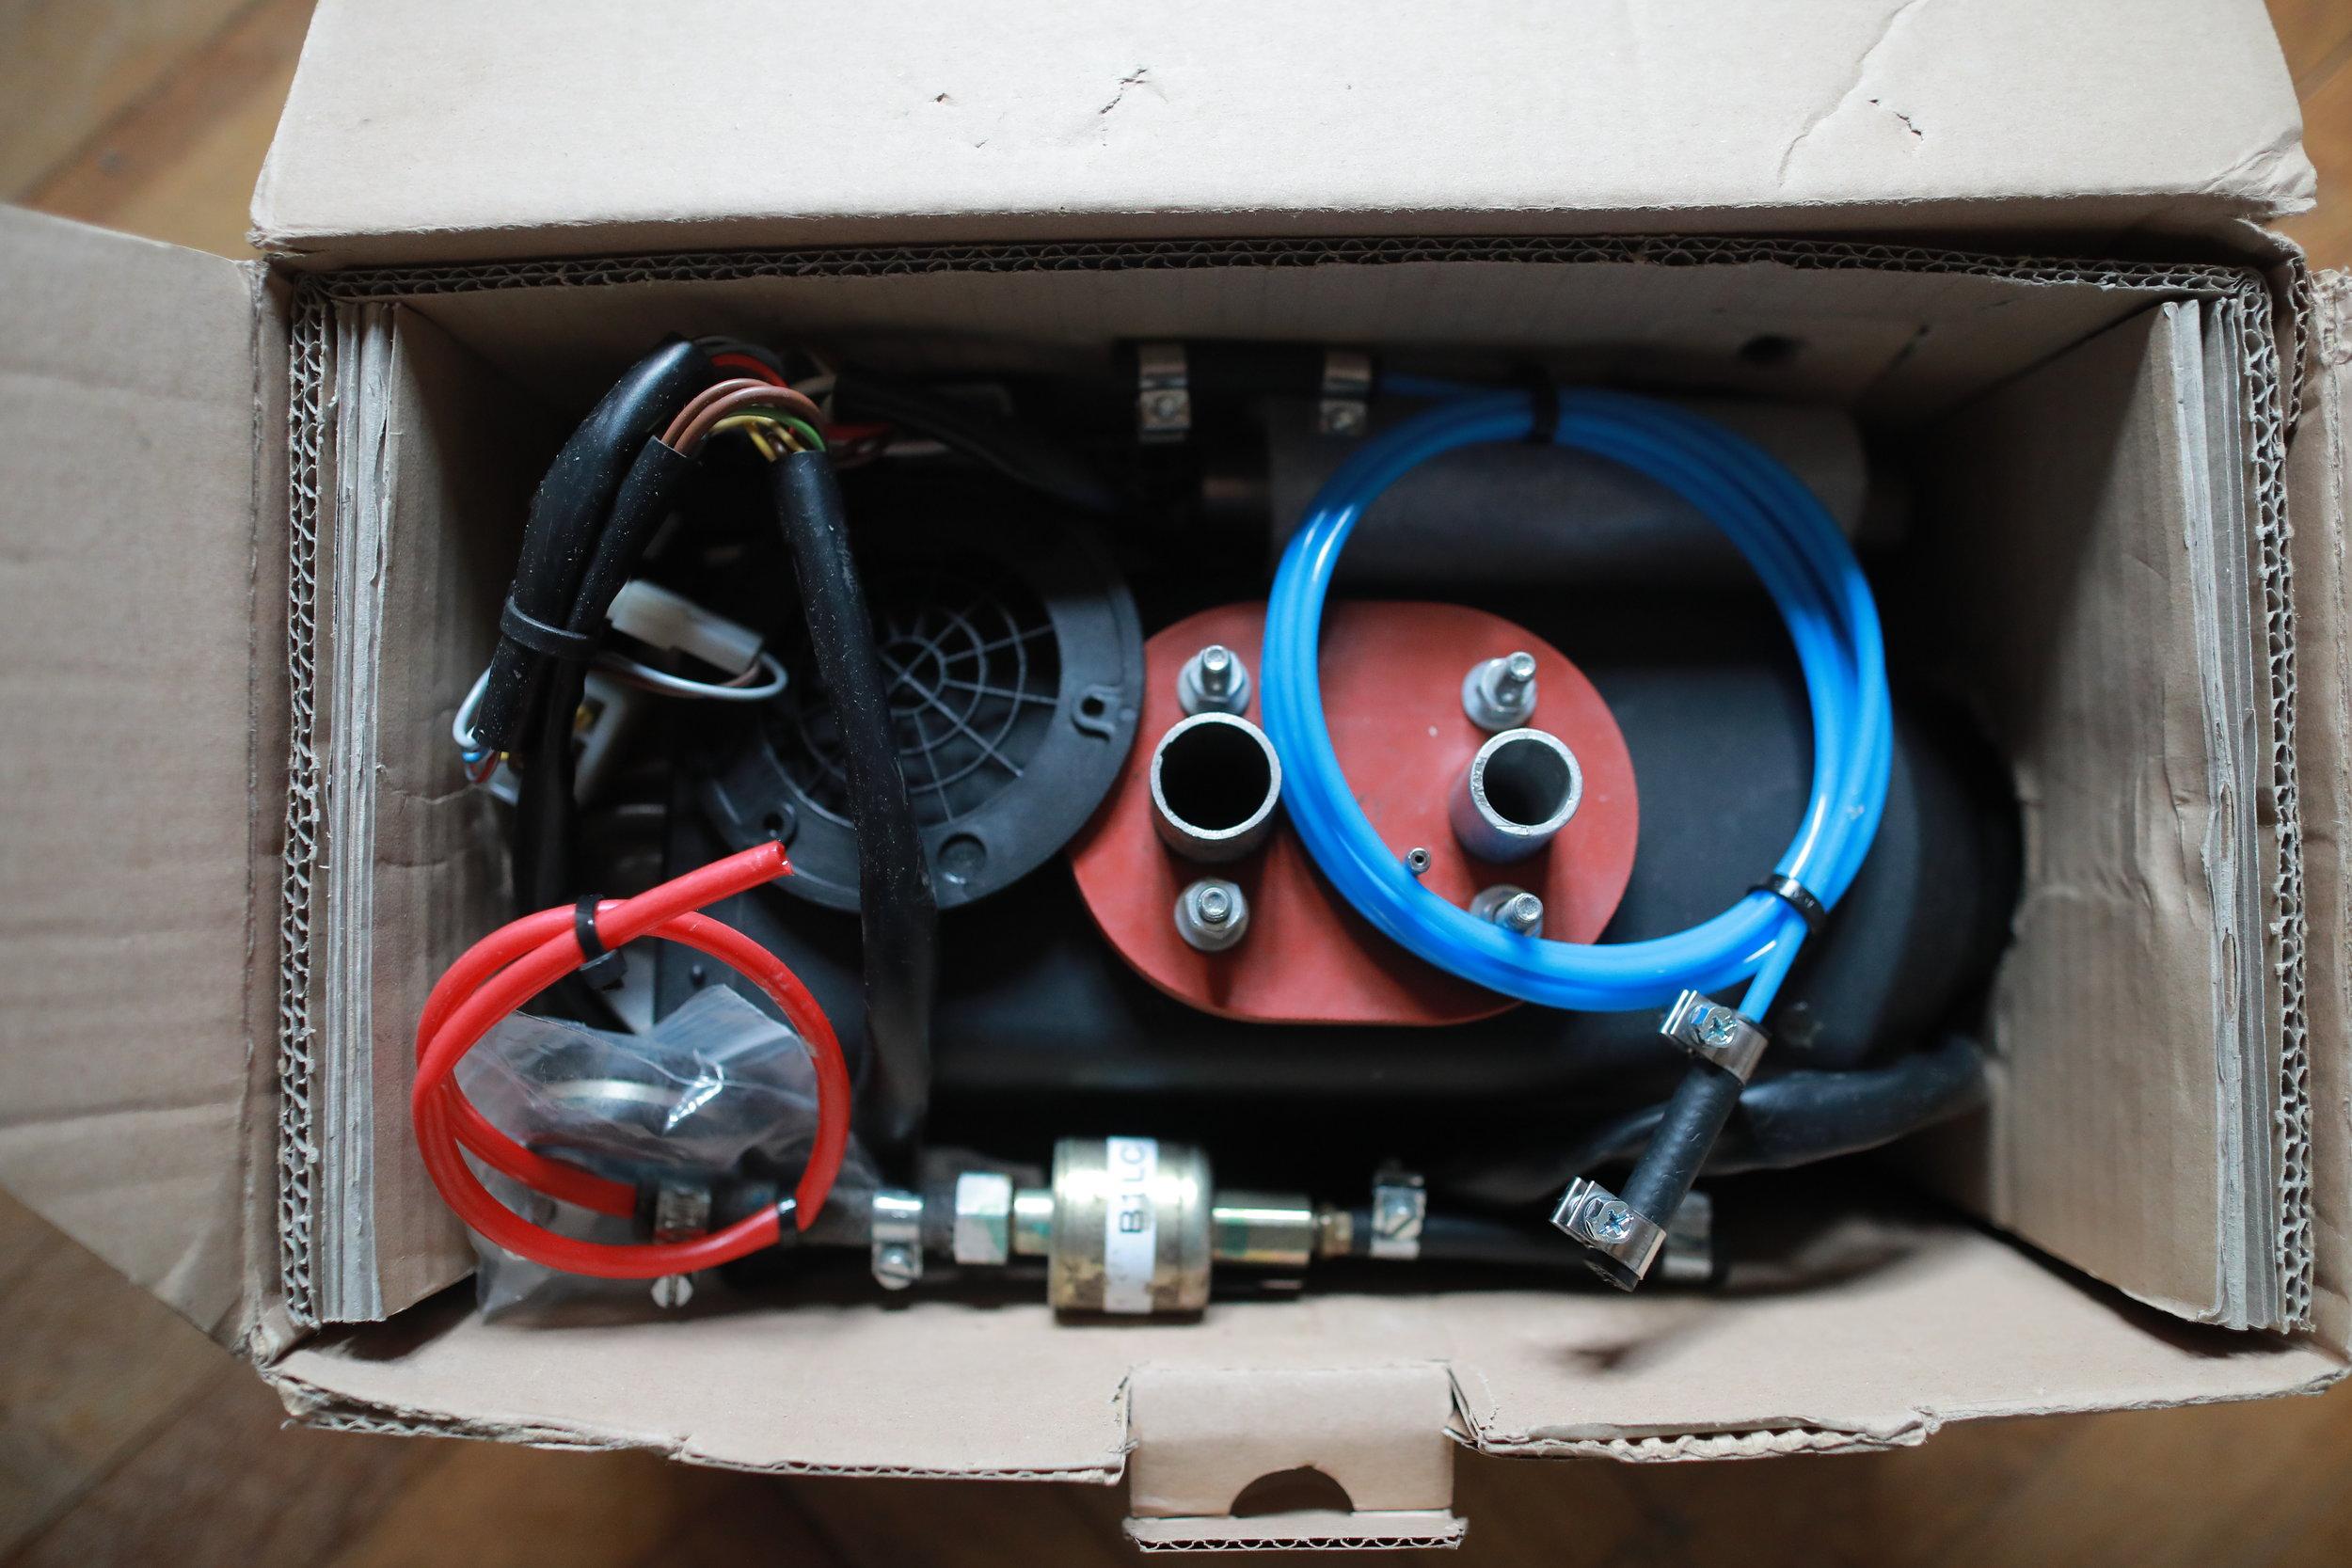 eberspacher, petrol eberspacher, eberspacher b1